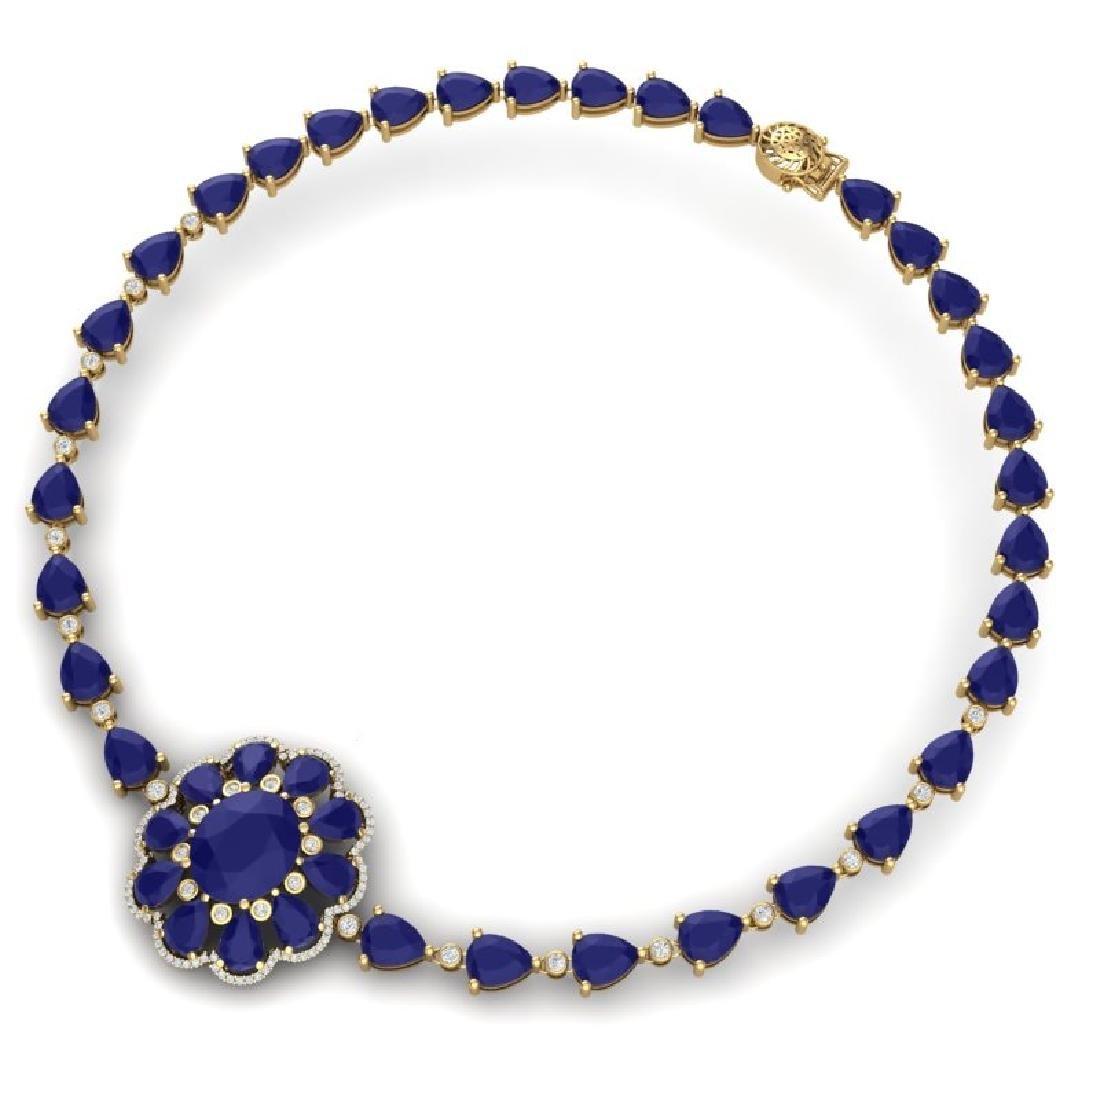 78.98 CTW Royalty Sapphire & VS Diamond Necklace 18K - 3